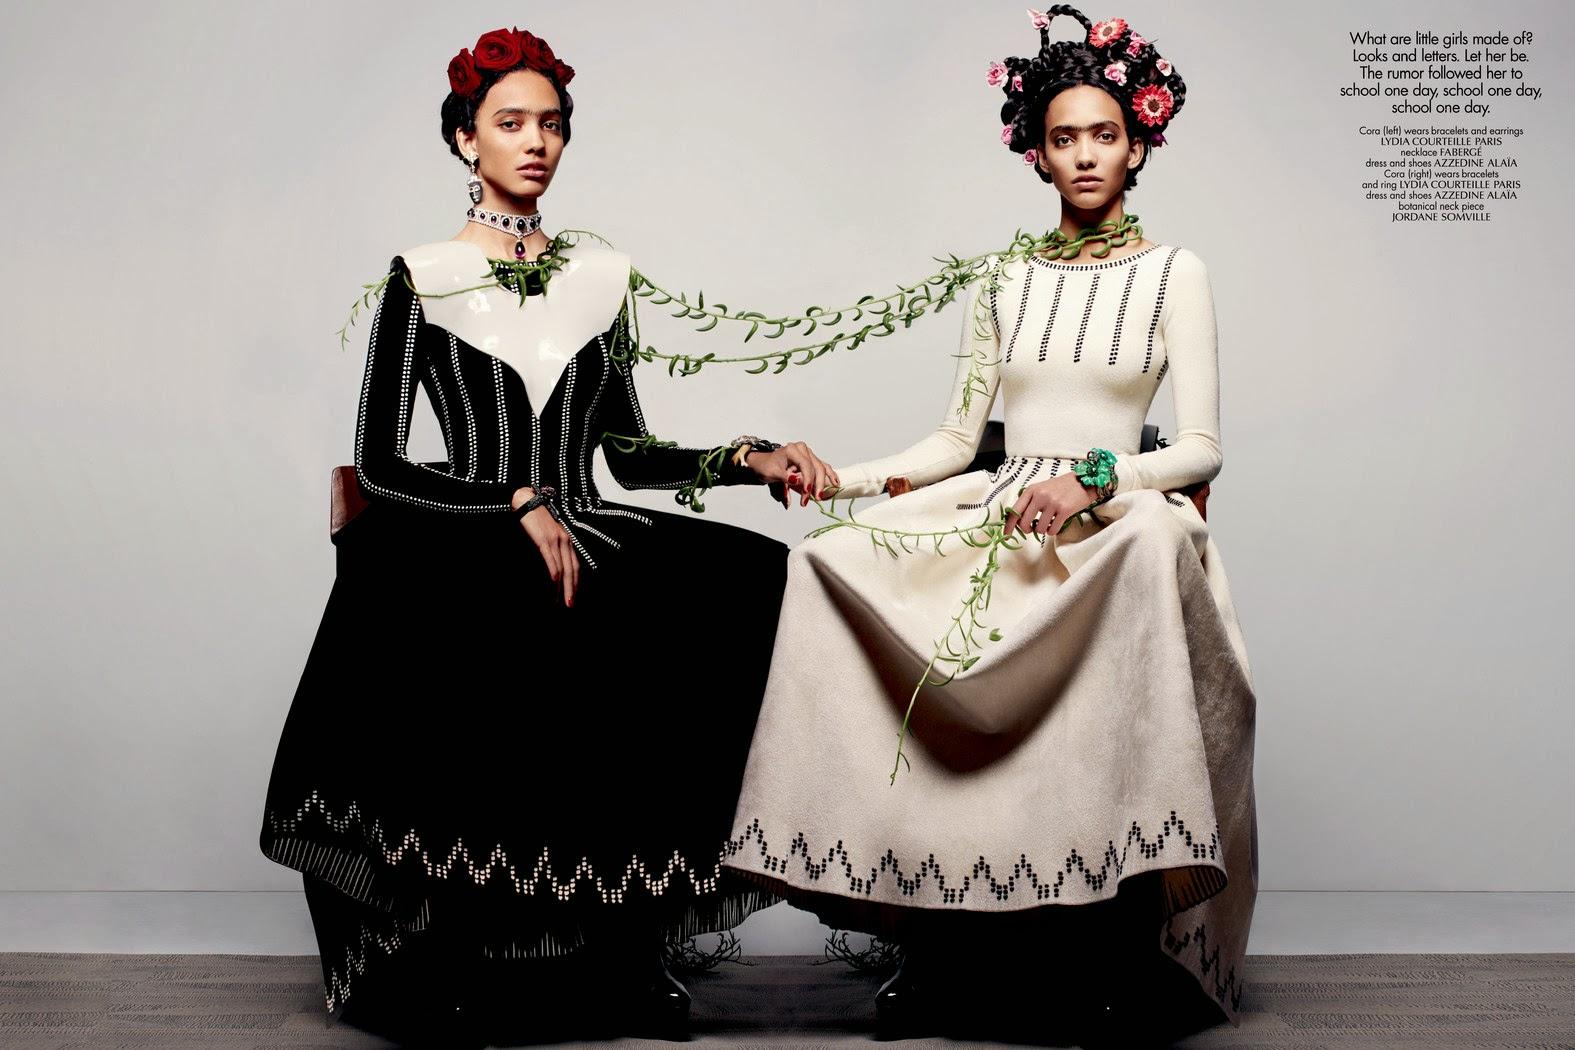 virgos_cora_emmanuel_senait_gidey_linn_arvidsson_malaika_firth_maria_borges_miche_le_lamy_anthony_maule_carine_roitfeld_CR_fashion_book_3_04.jpg